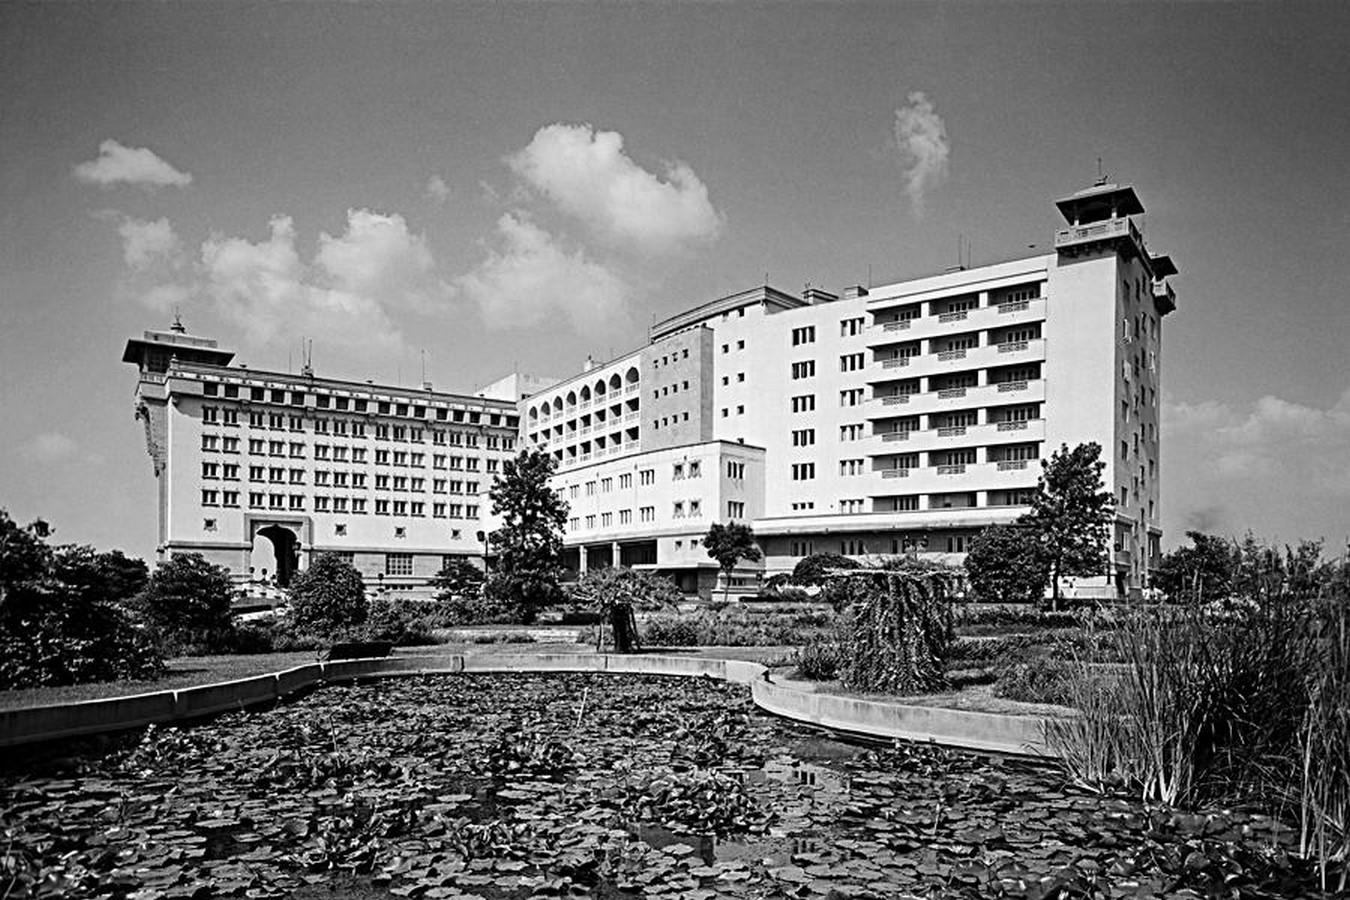 Ashoka Hotel by B E Doctor: Delhi's oldest 5-star hotel - Sheet1